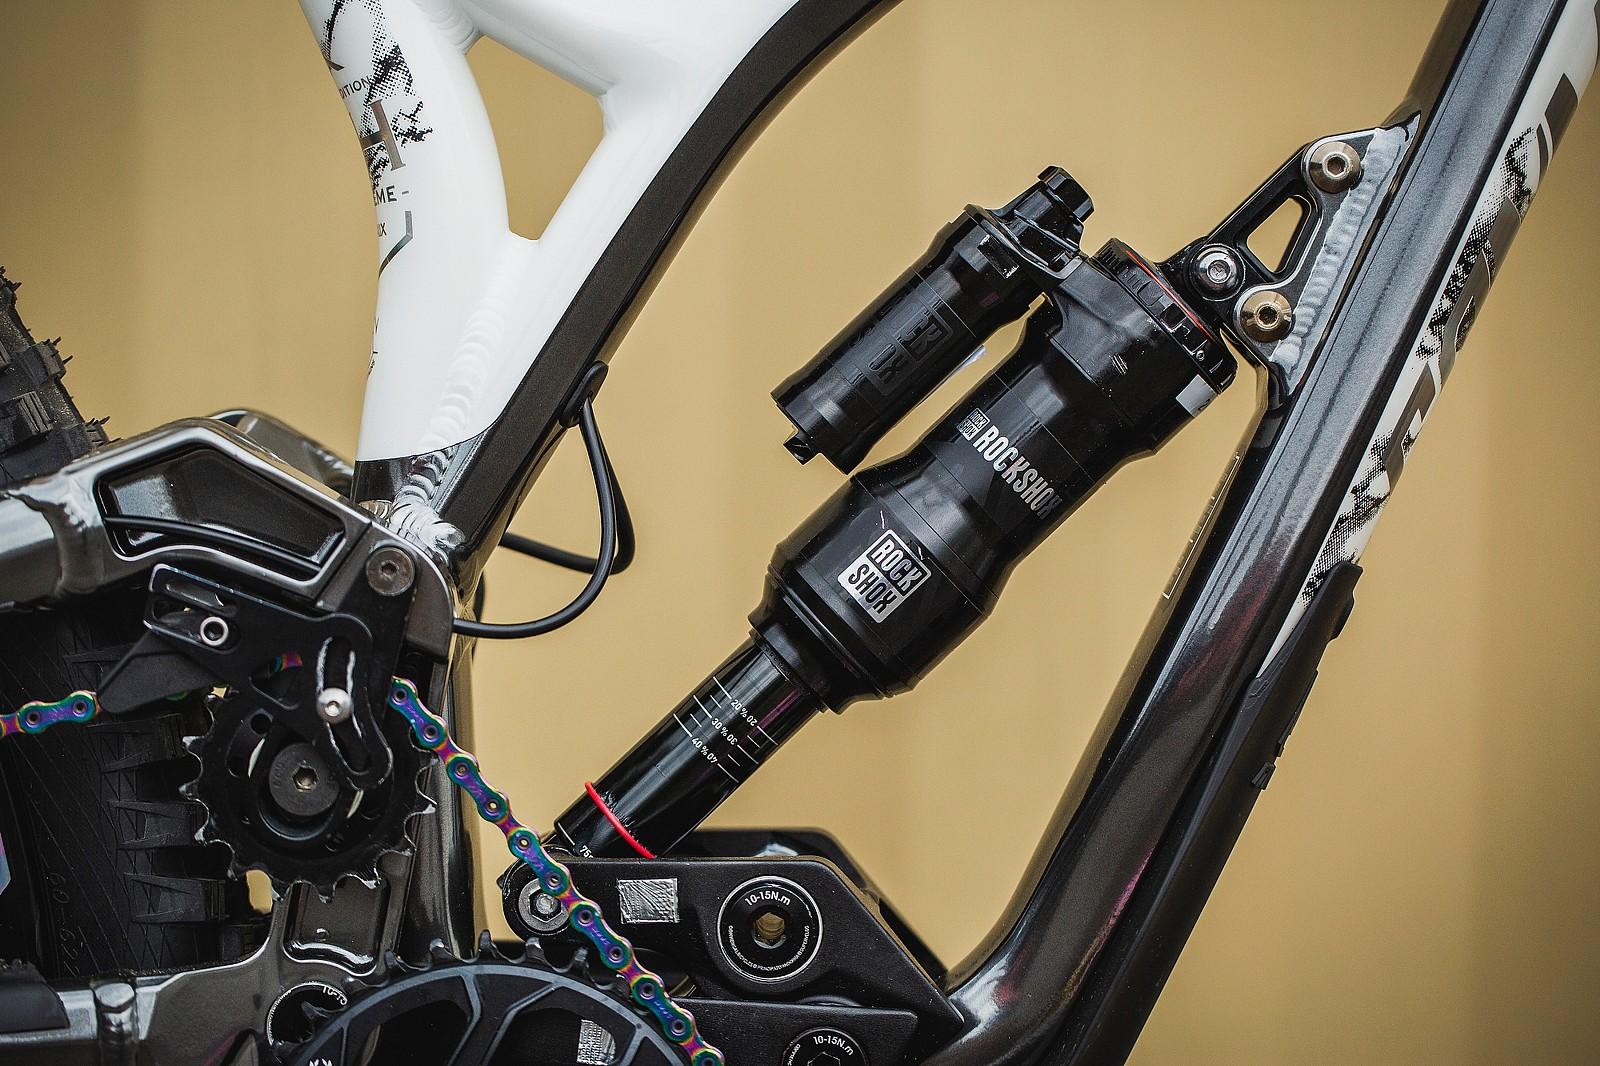 Amaury Pierron's Commencal Supreme DH 29 at 2019 Worlds MSA - Amaury Pierron's Commencal Supreme DH 29 at 2019 Worlds MSA - Mountain Biking Pictures - Vital MTB